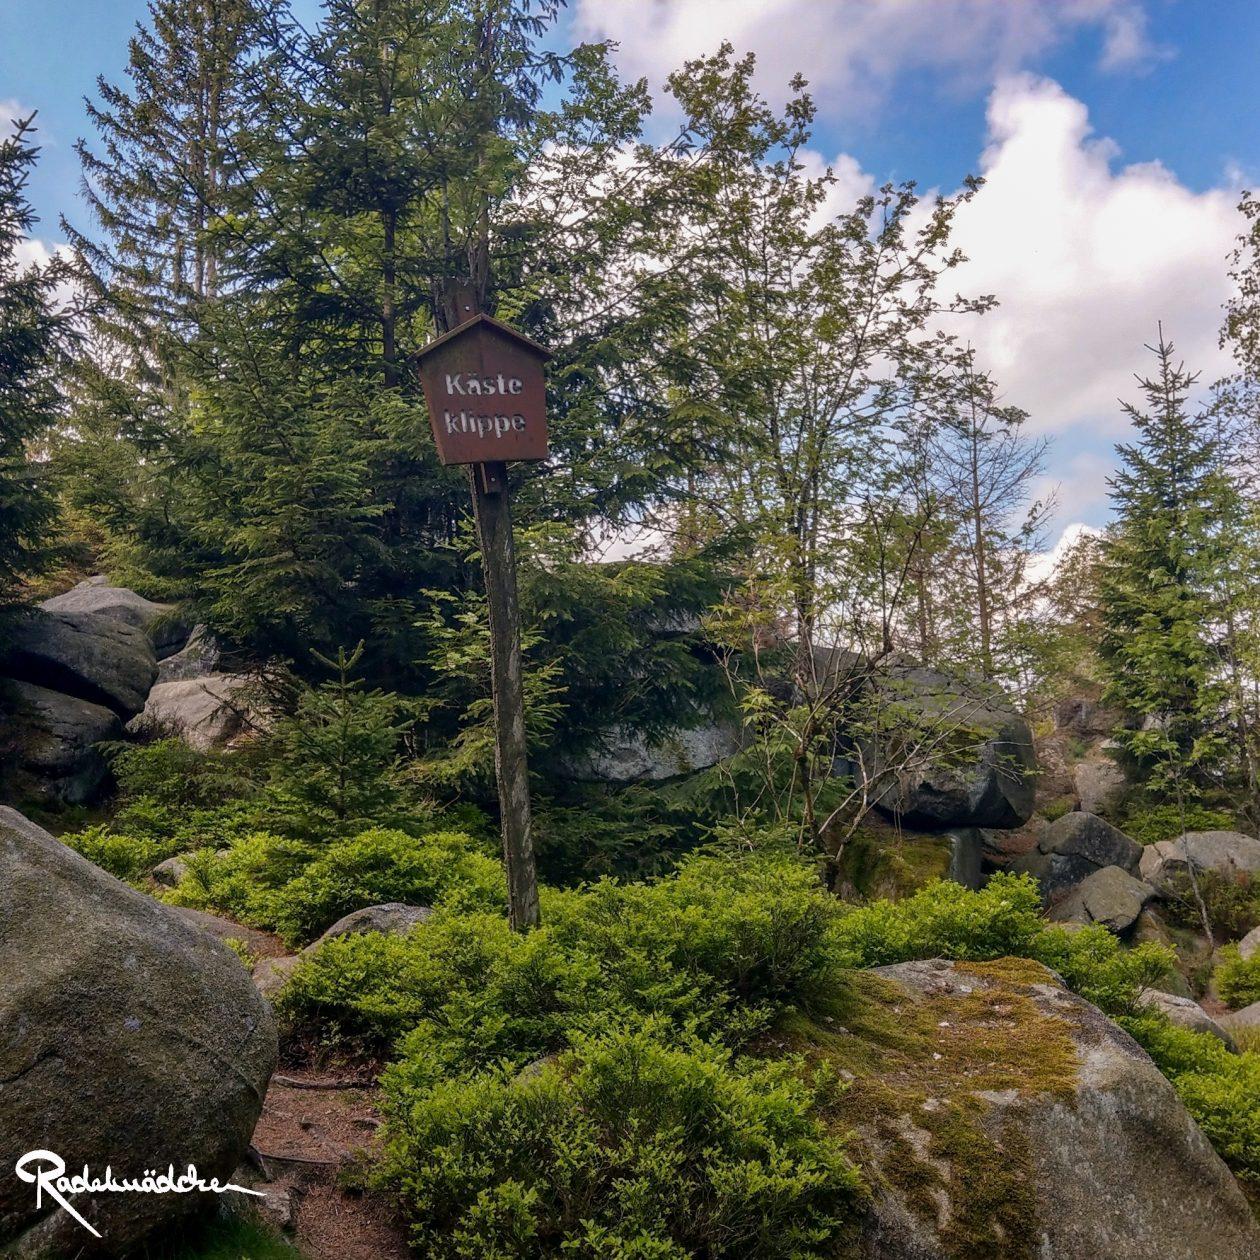 E-MTB-Mountainbike-Harz-Wernigerode-ebike-your-life_Radelmaedchen_Juliane-S-5